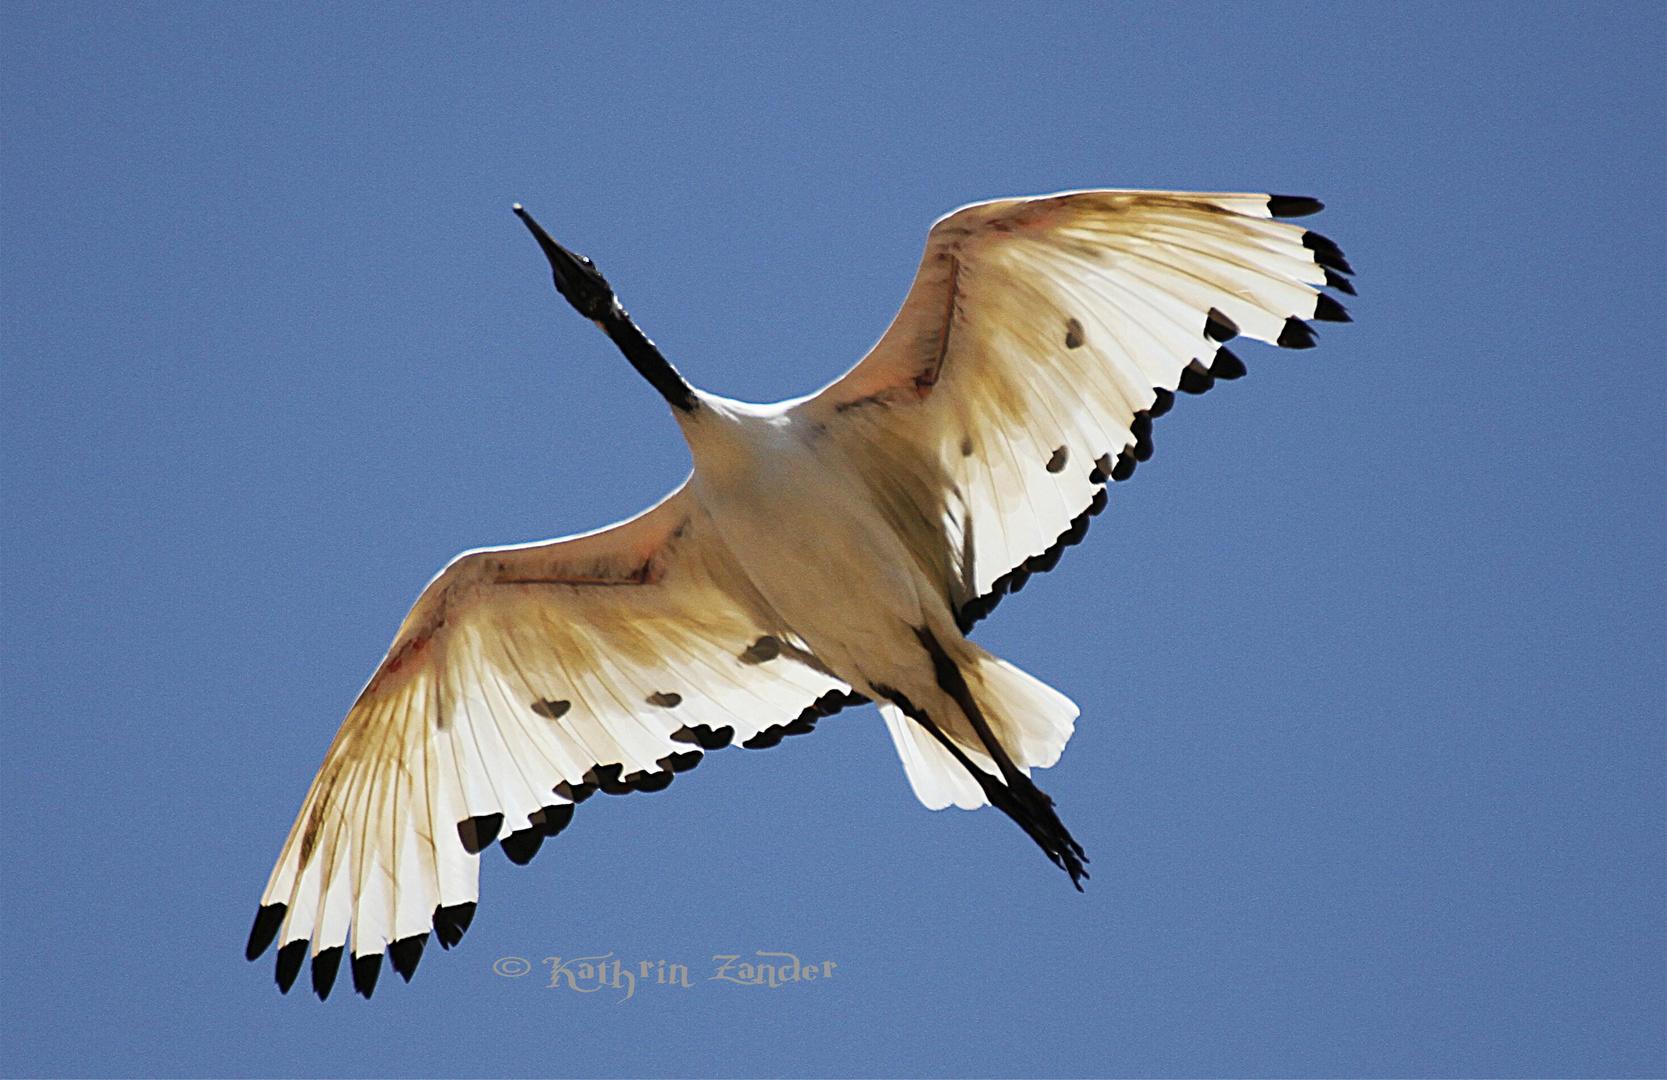 Ibiss im Flug